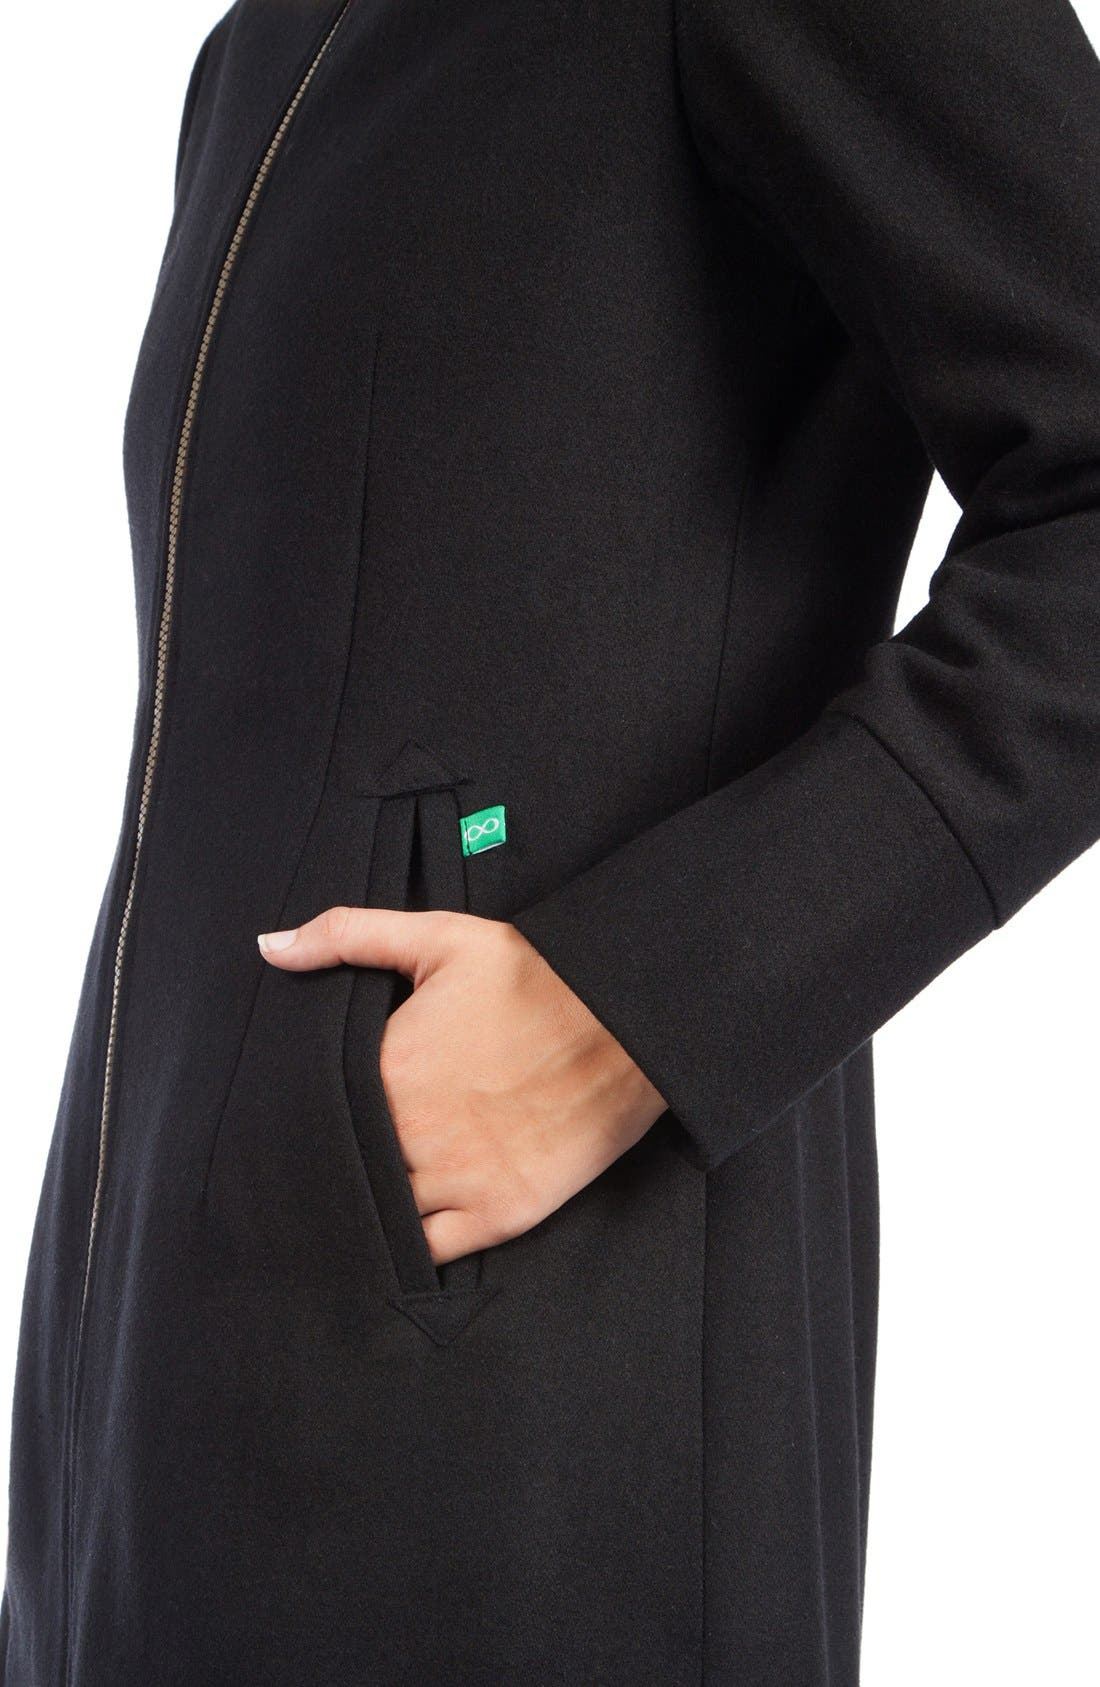 Convertible 3-in-1 Maternity/Nursing Coat,                             Alternate thumbnail 10, color,                             BLACK